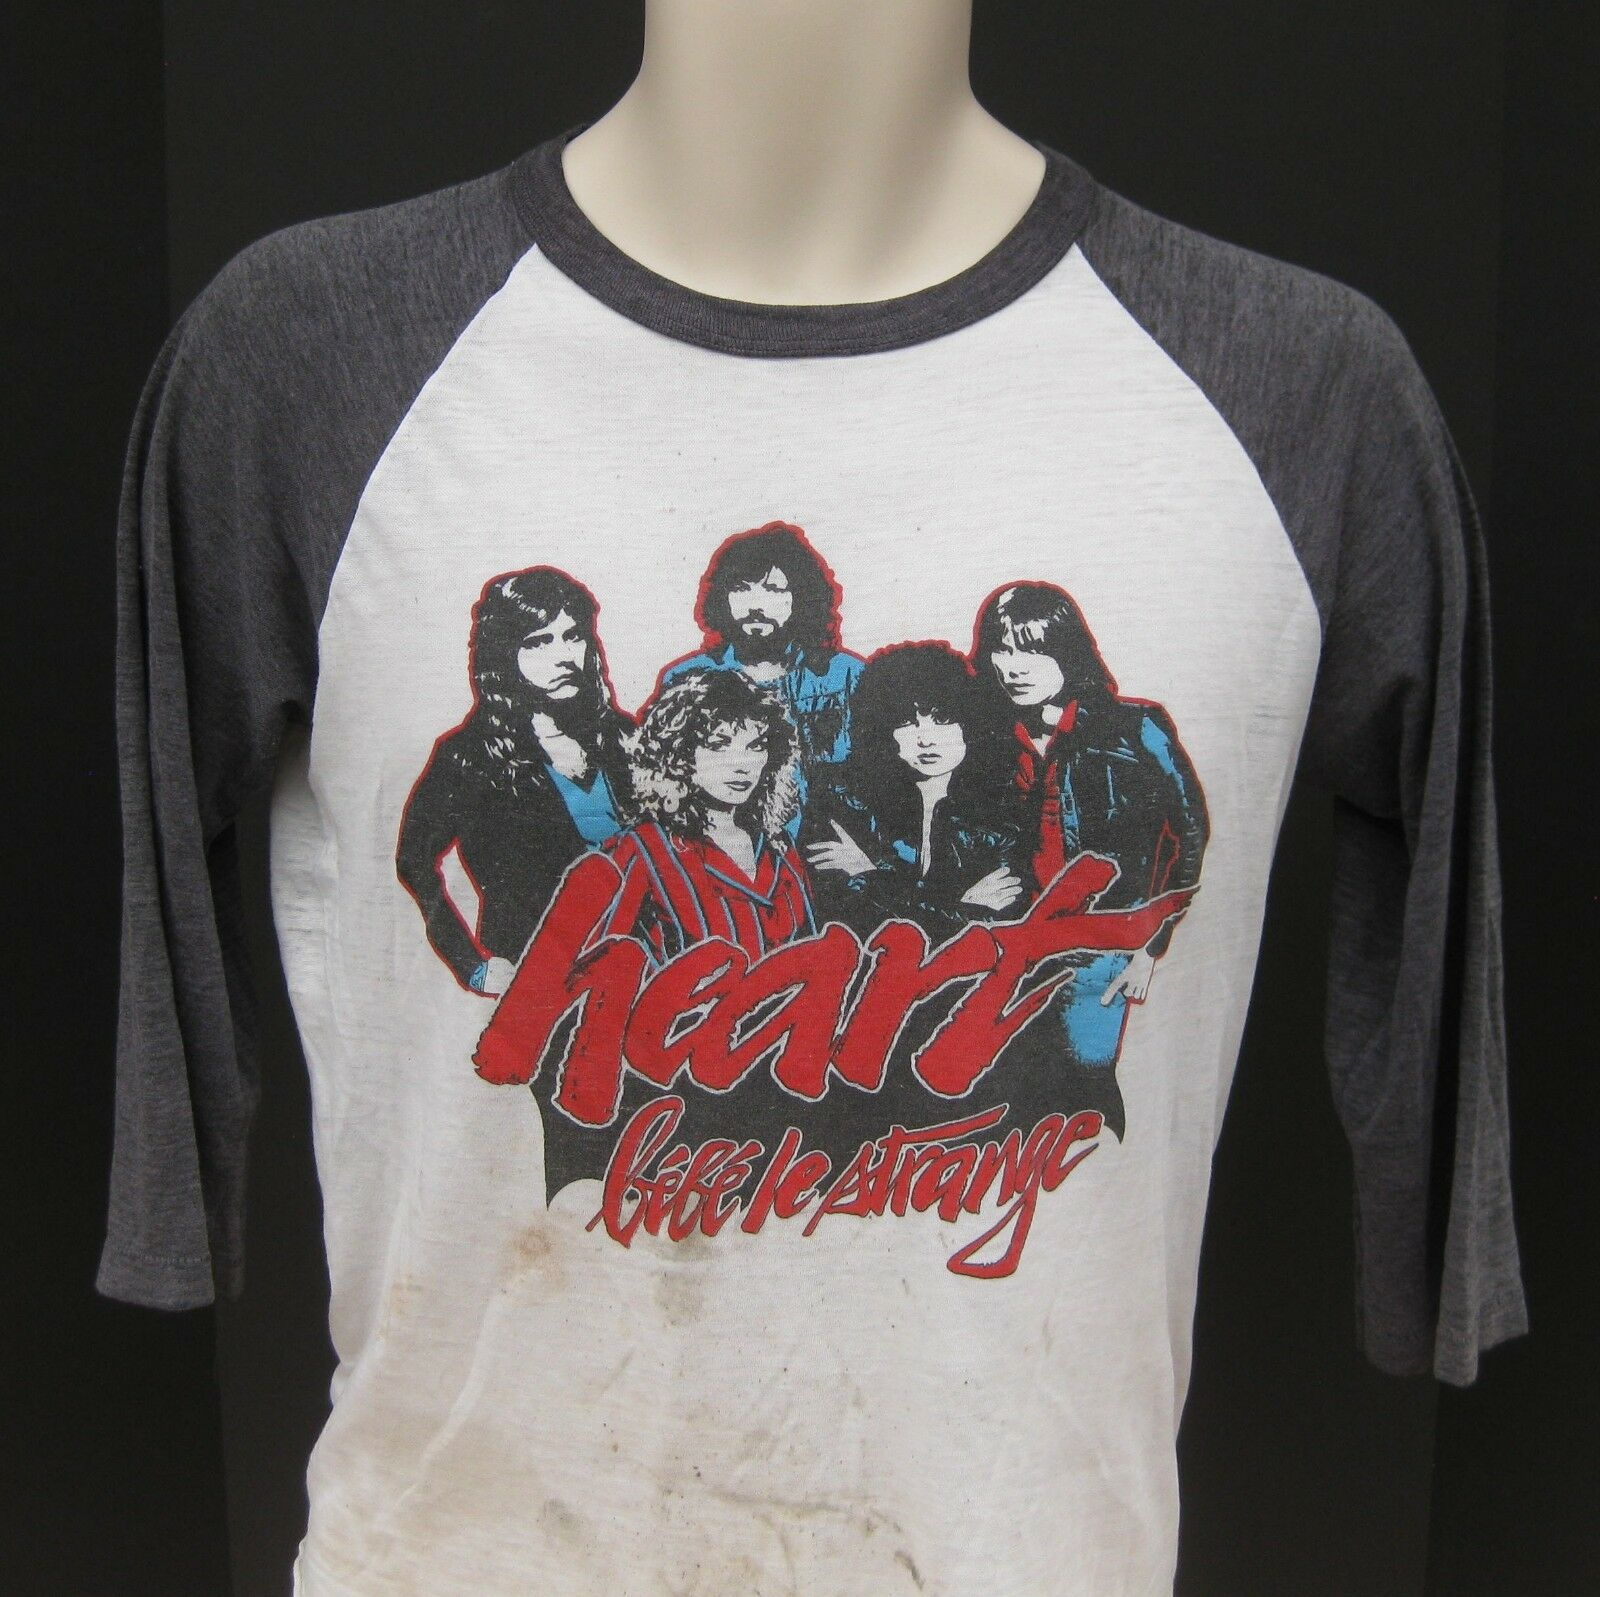 VTG 1980 Heart Bebe Le Strange World Tour Concert Shirt Adult Medium 80s Destroy